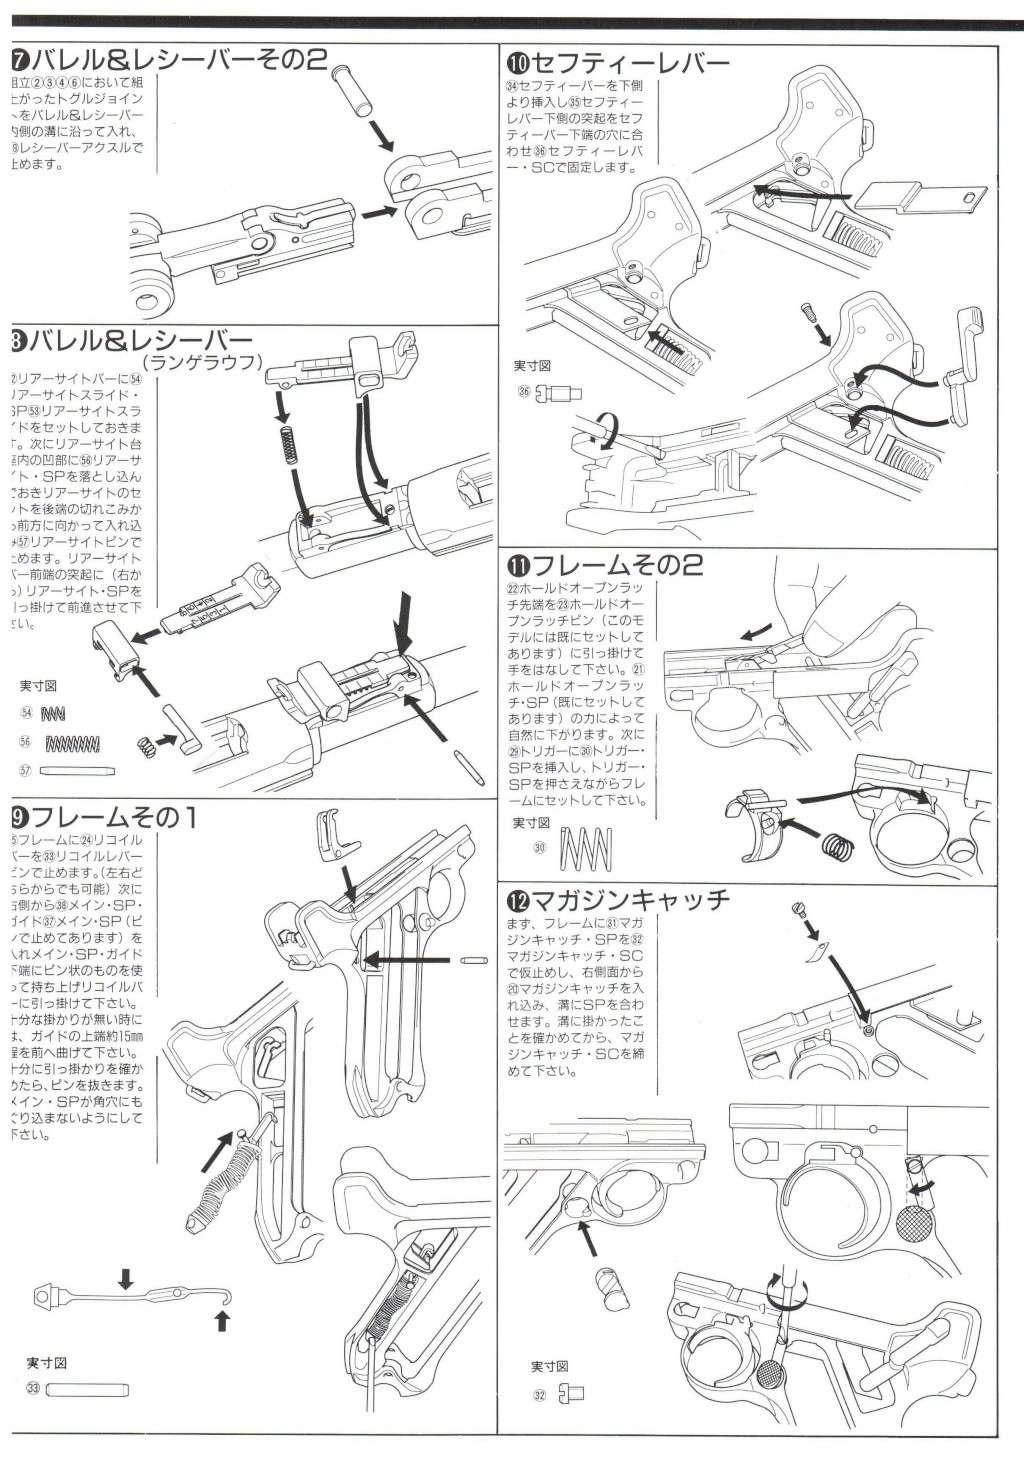 Marushin Metal KIT Dummy Cartridge Model LUGER P08 cal. 9